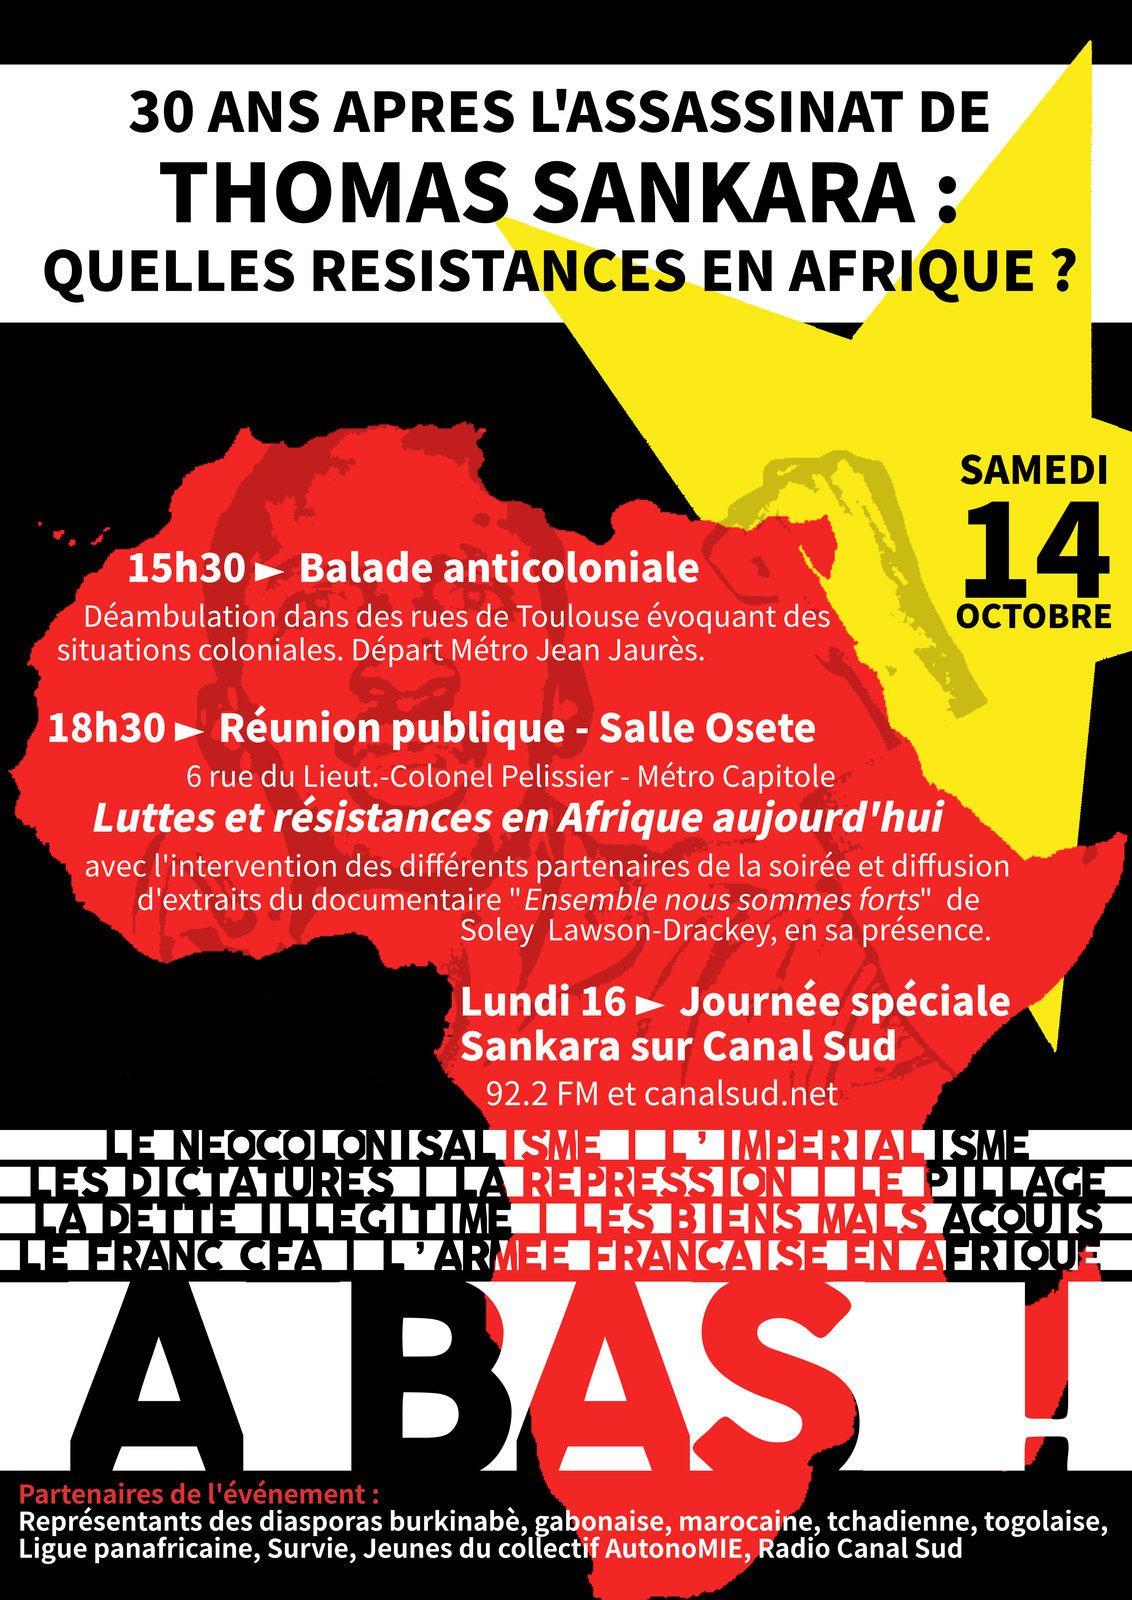 30 ans après l'assassinat de Thomas Sankara : Quelles résistances en Afrique ?